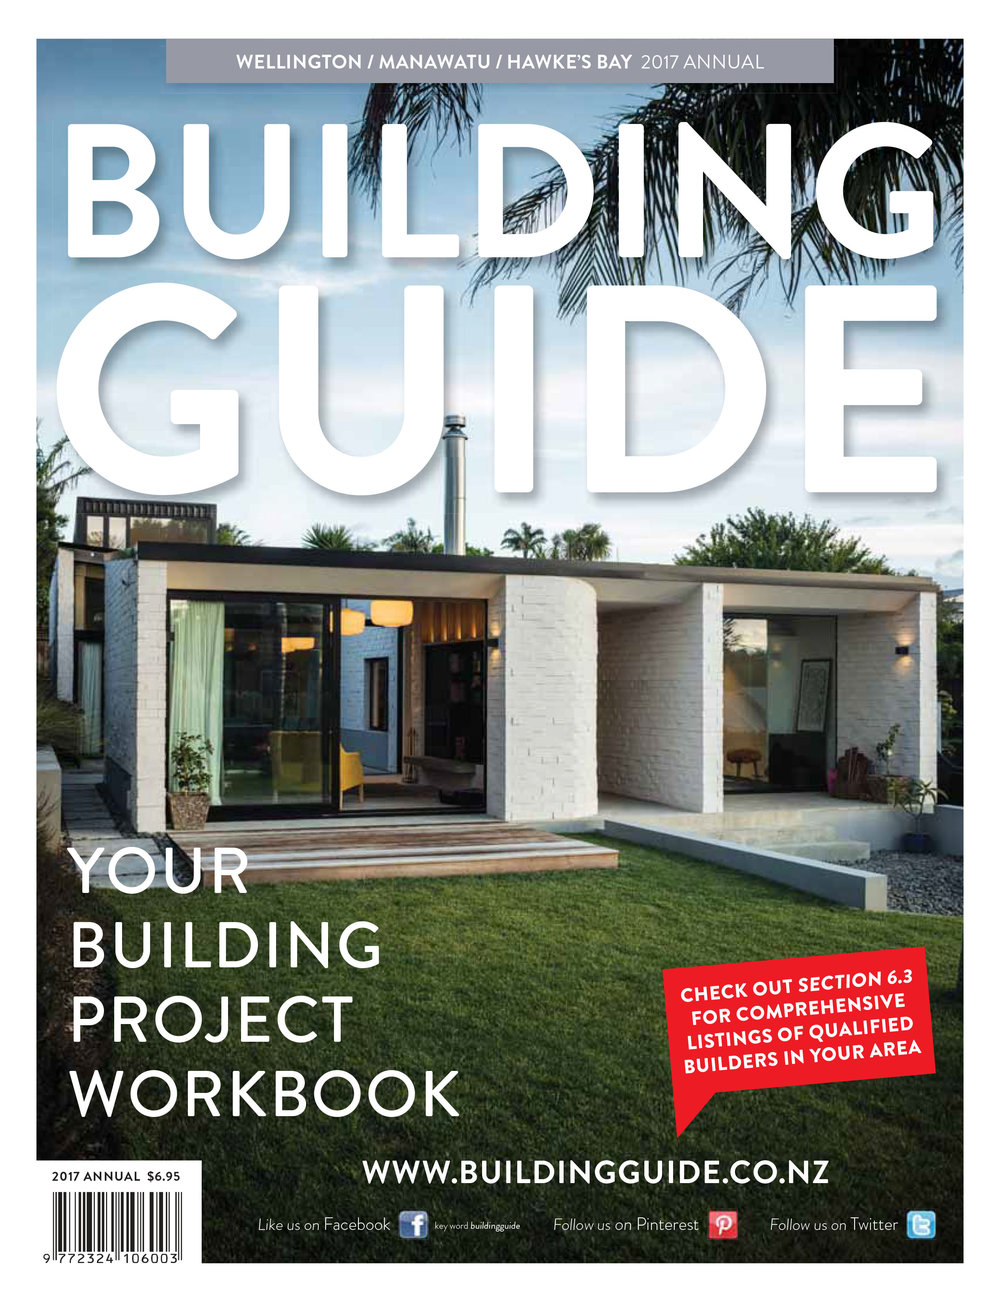 NZ_Homeowners_Building_Guide-Wellington-Manawatu-HawkesBay-1.jpg